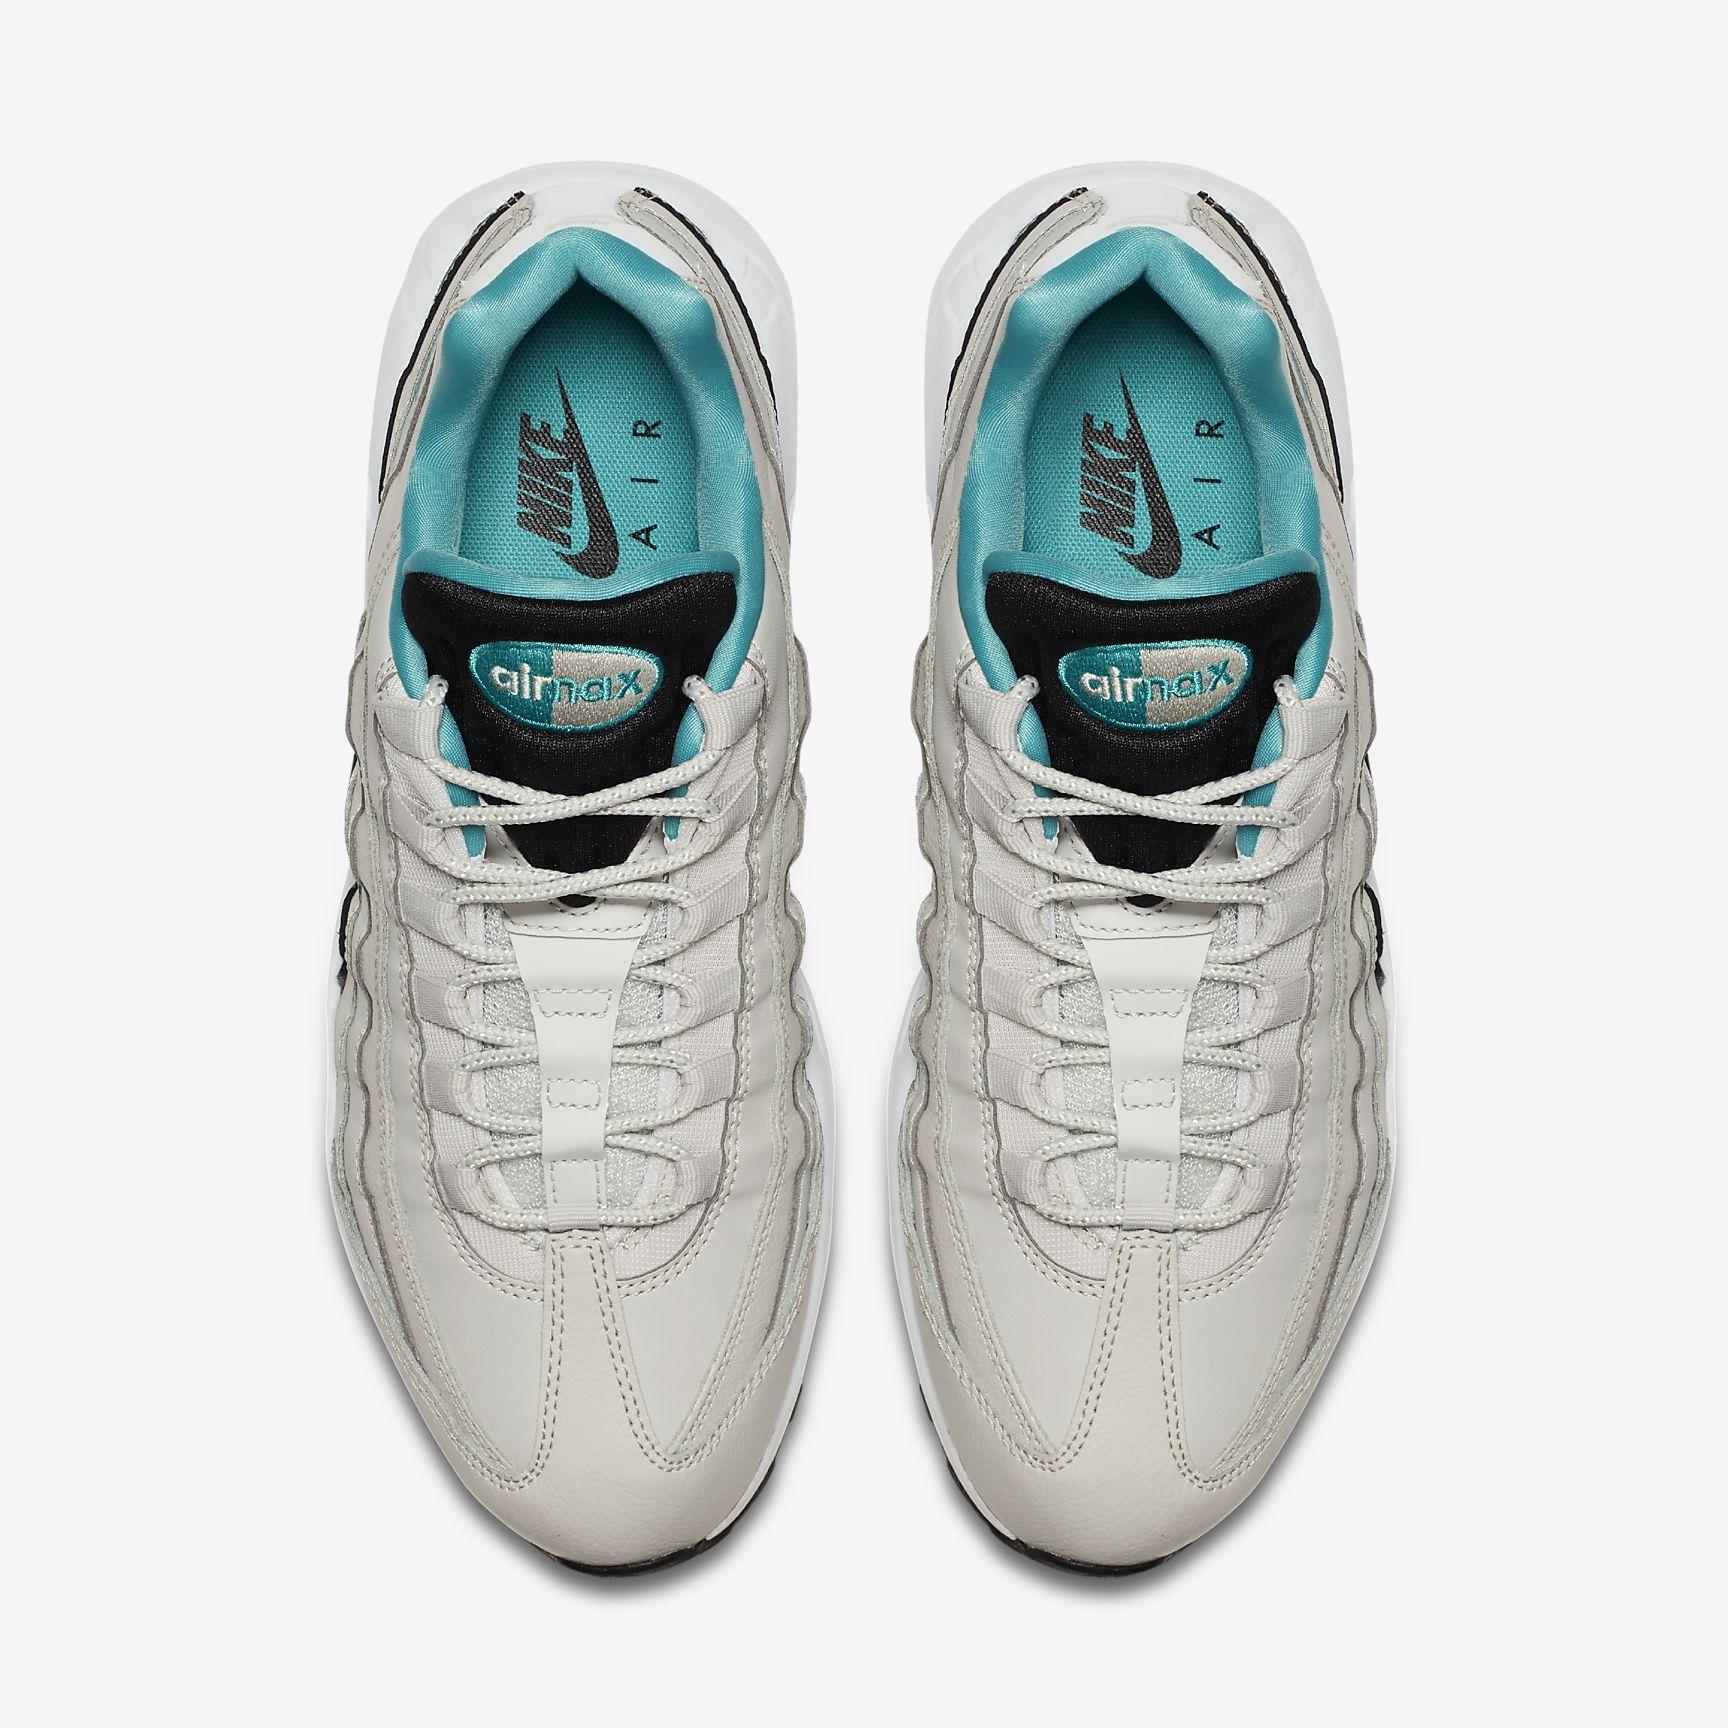 reputable site 96481 605d9 Chaussures Homme AIR MAX 95 Essential Beige clair Noir Blanc Turquoise Sport